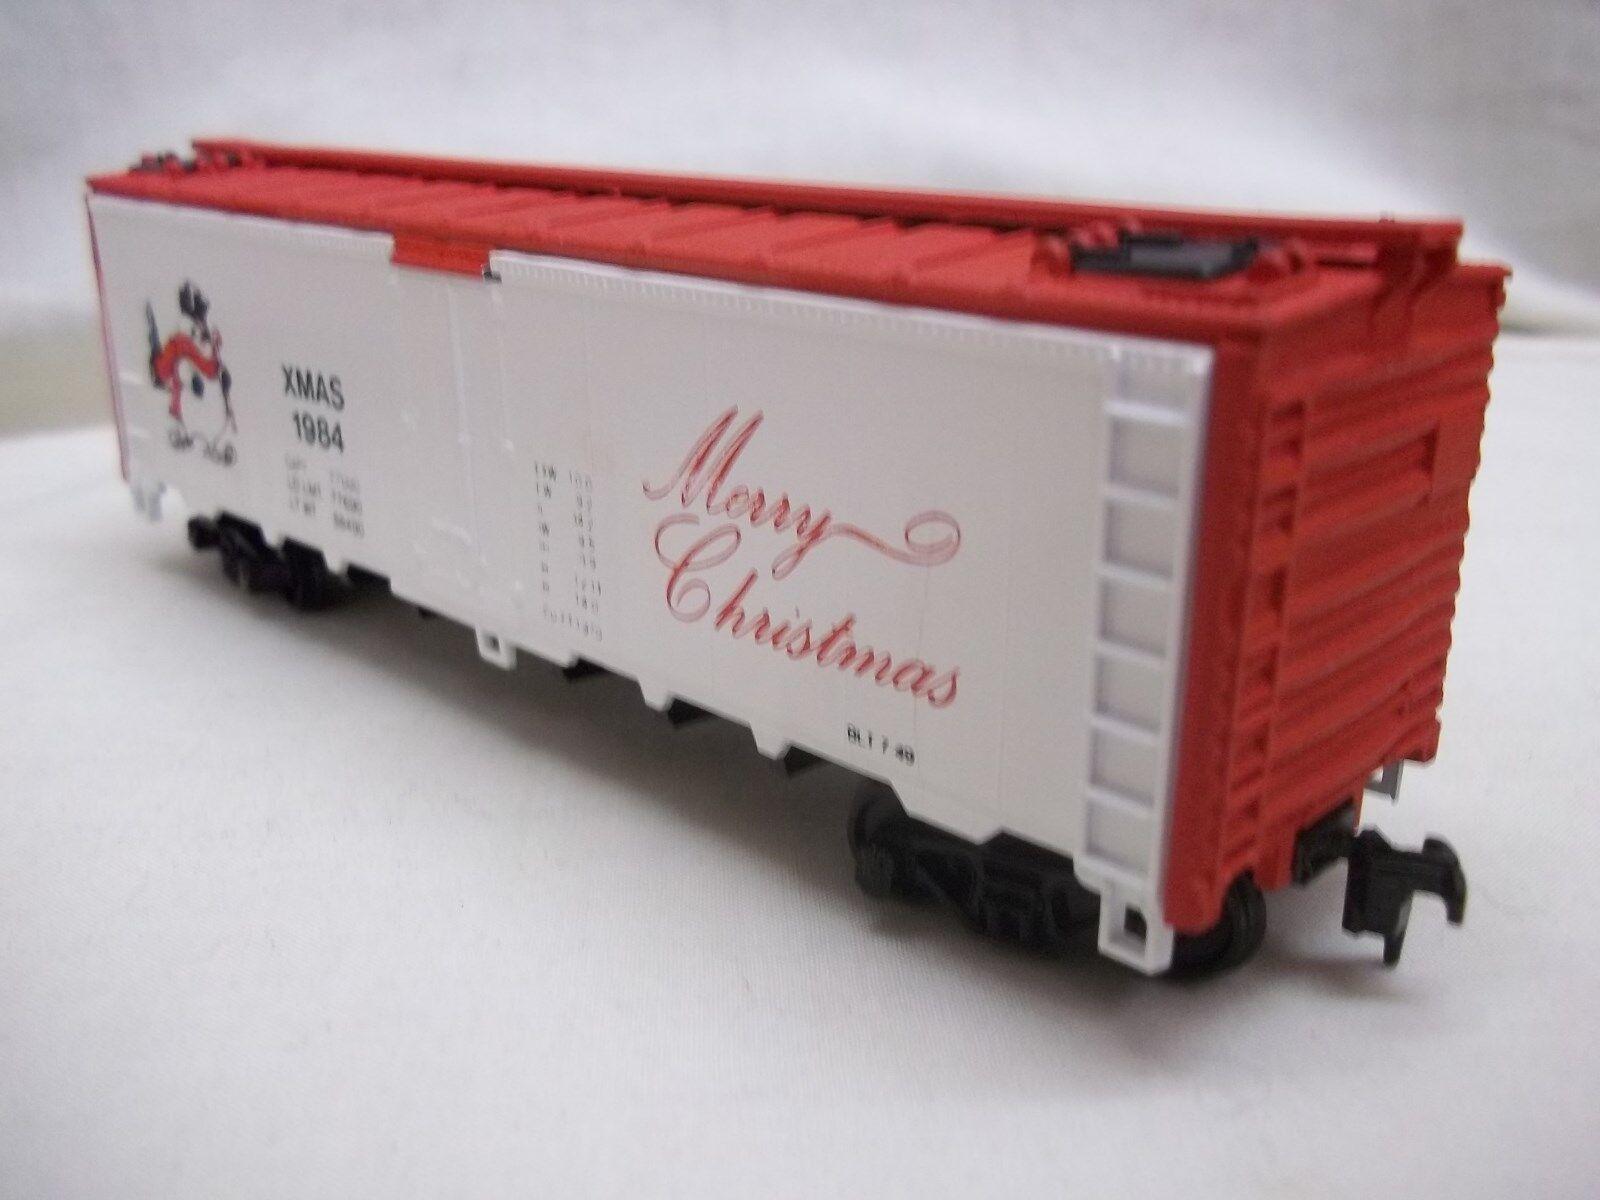 ATHEARN CON-COR CHRISTMAS TRAIN LMTD edizione 1984 ICE ICE ICE BUNKER REEFER HO SCALE nuovo 5f6d84